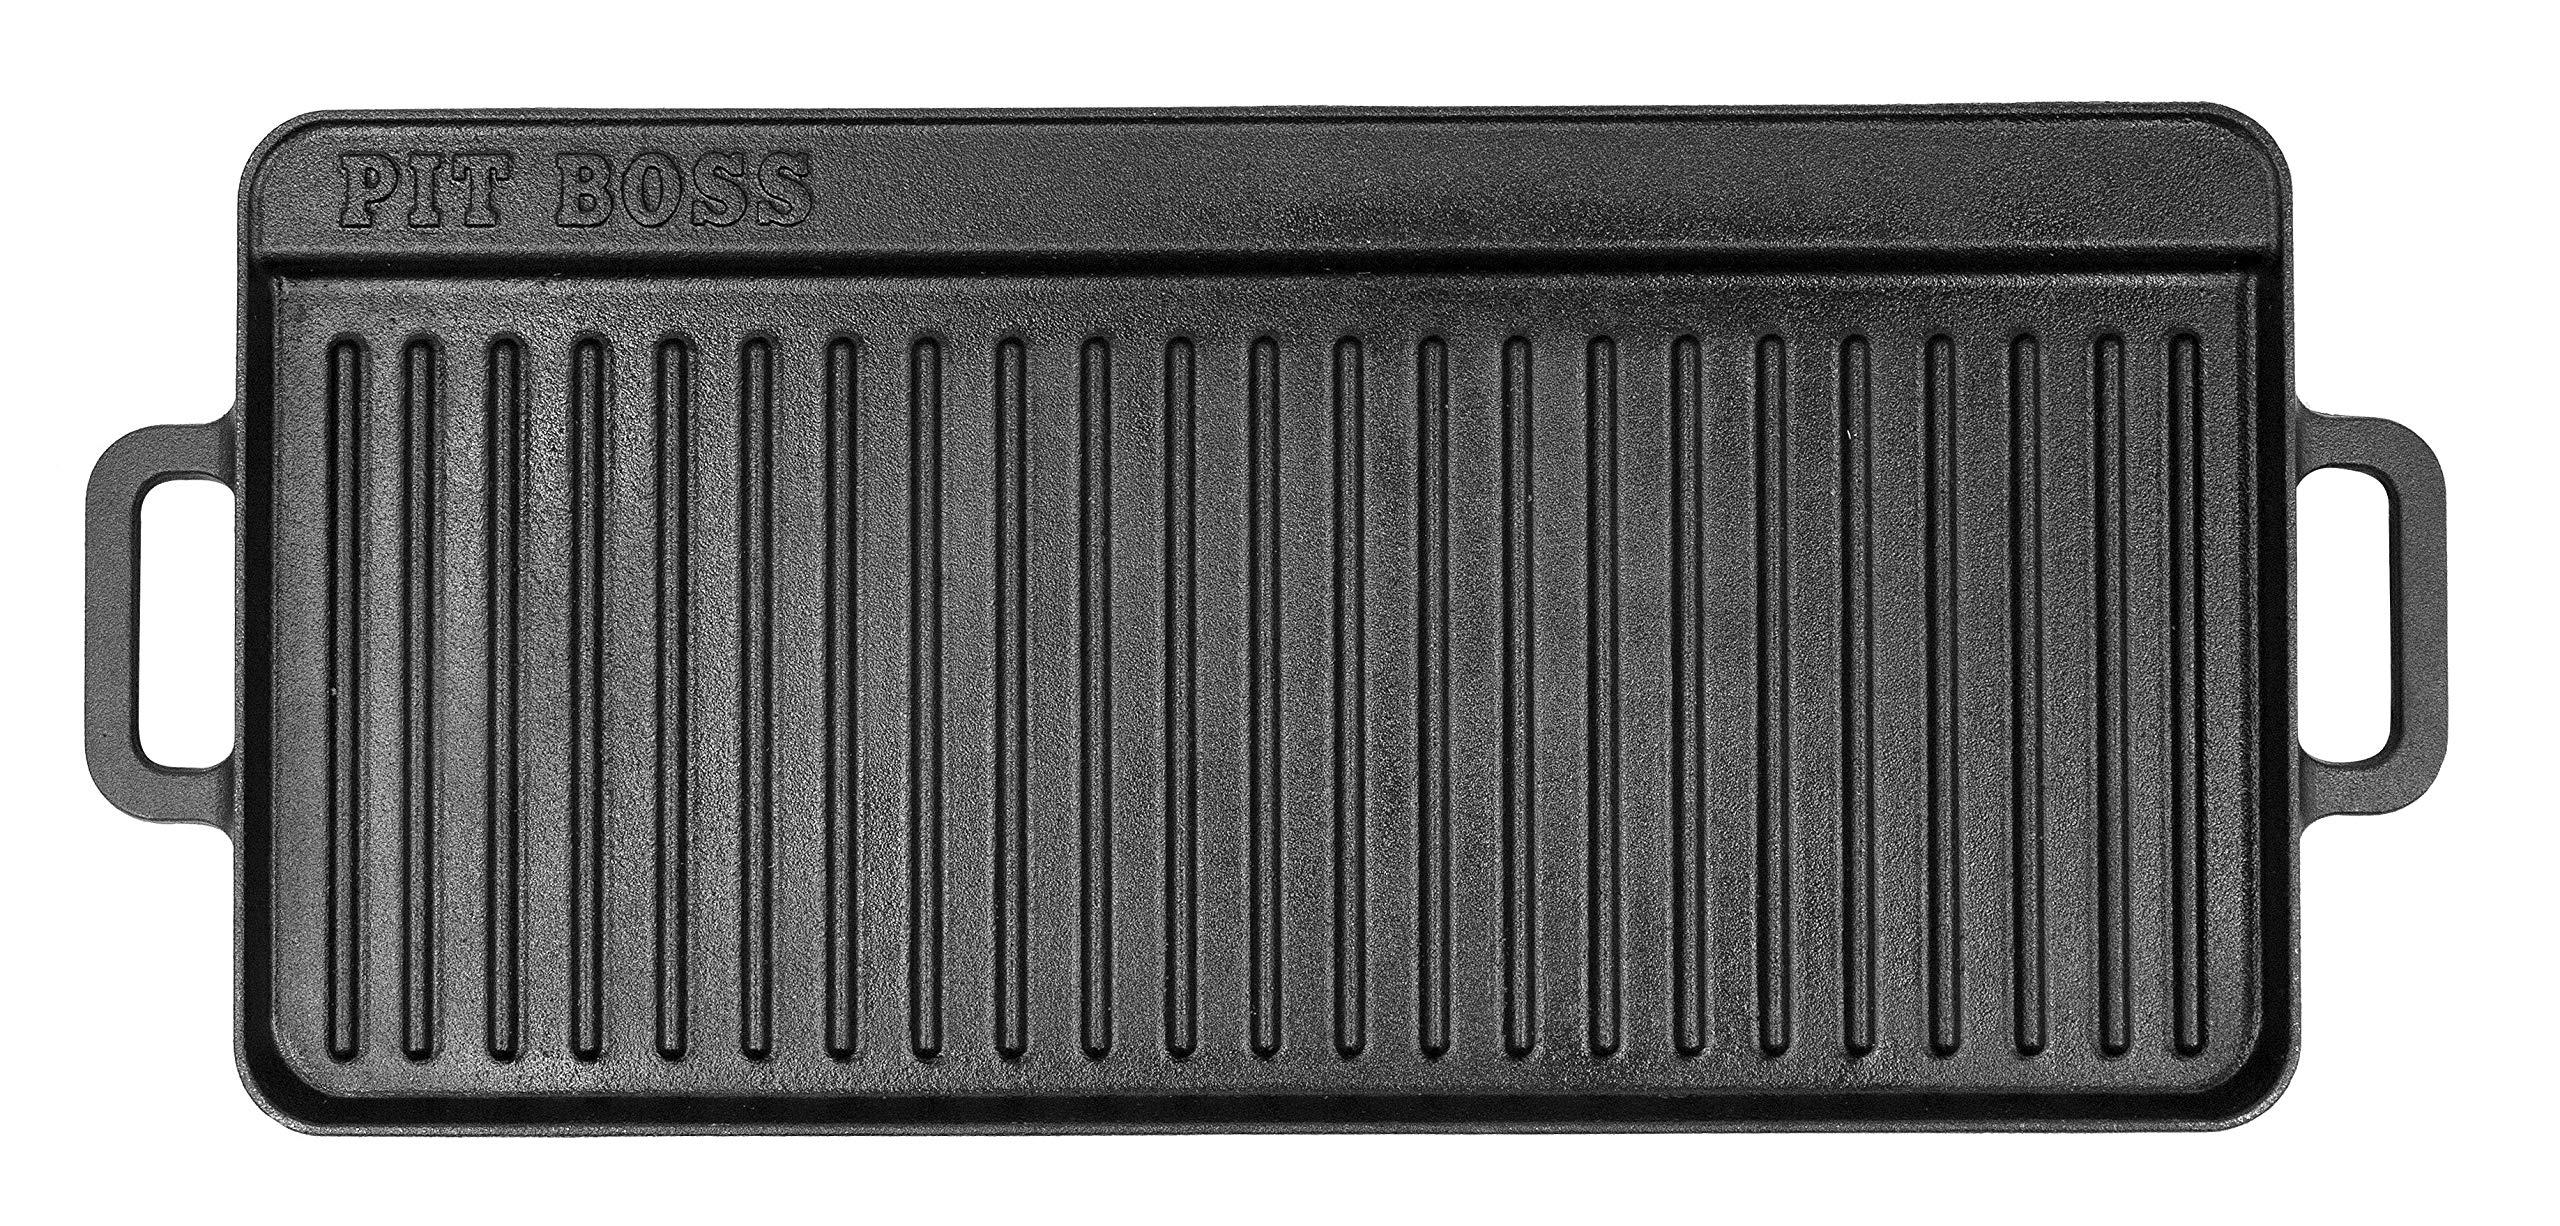 PIT BOSS 68008 14'' x 28'' Cast Iron Griddle, Black by PIT BOSS